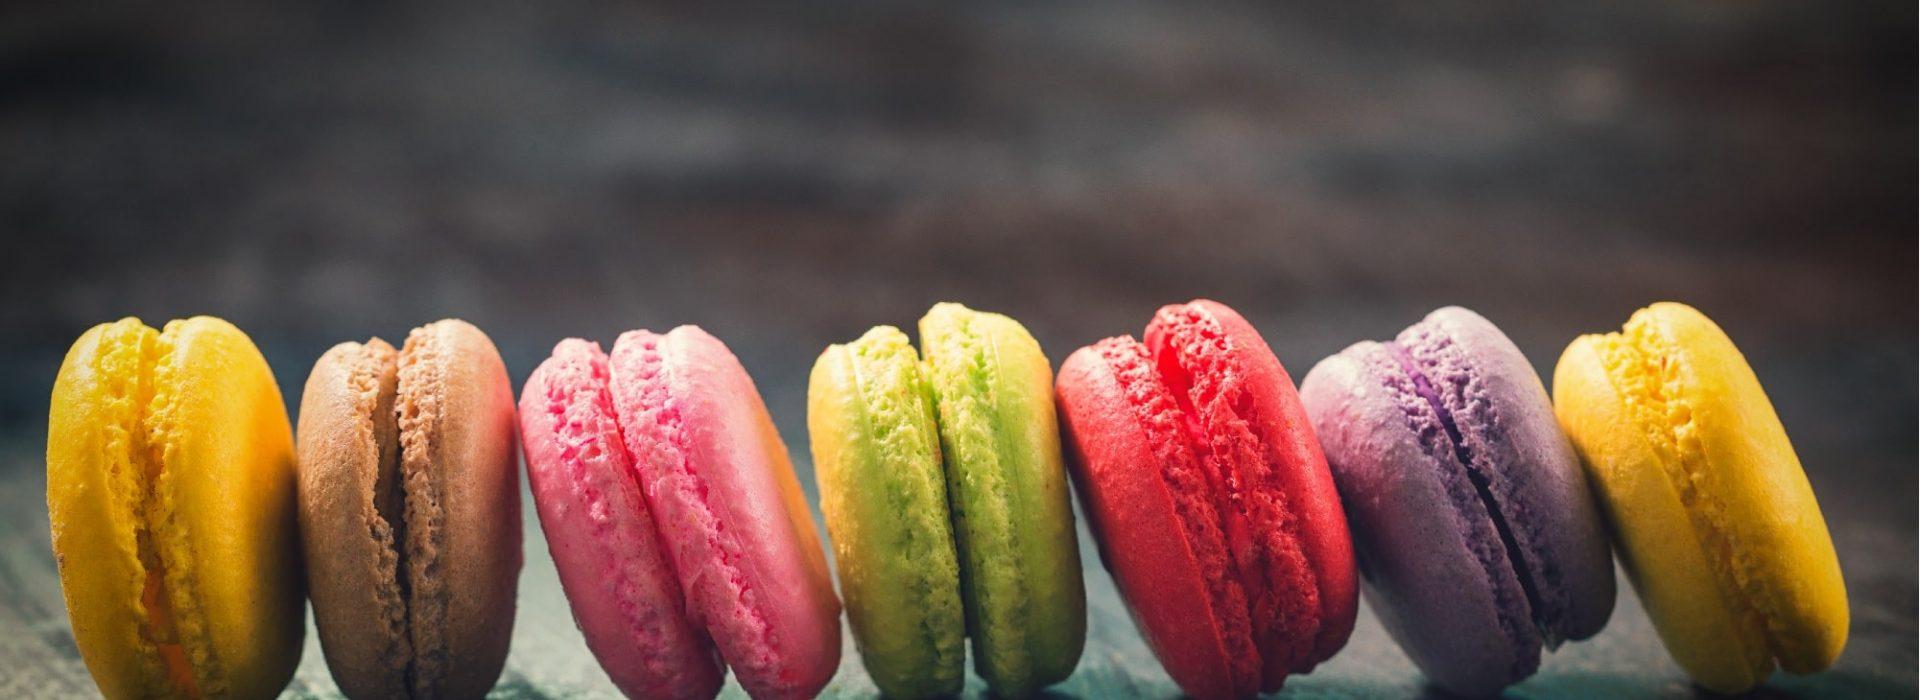 French Macaron Blog Image